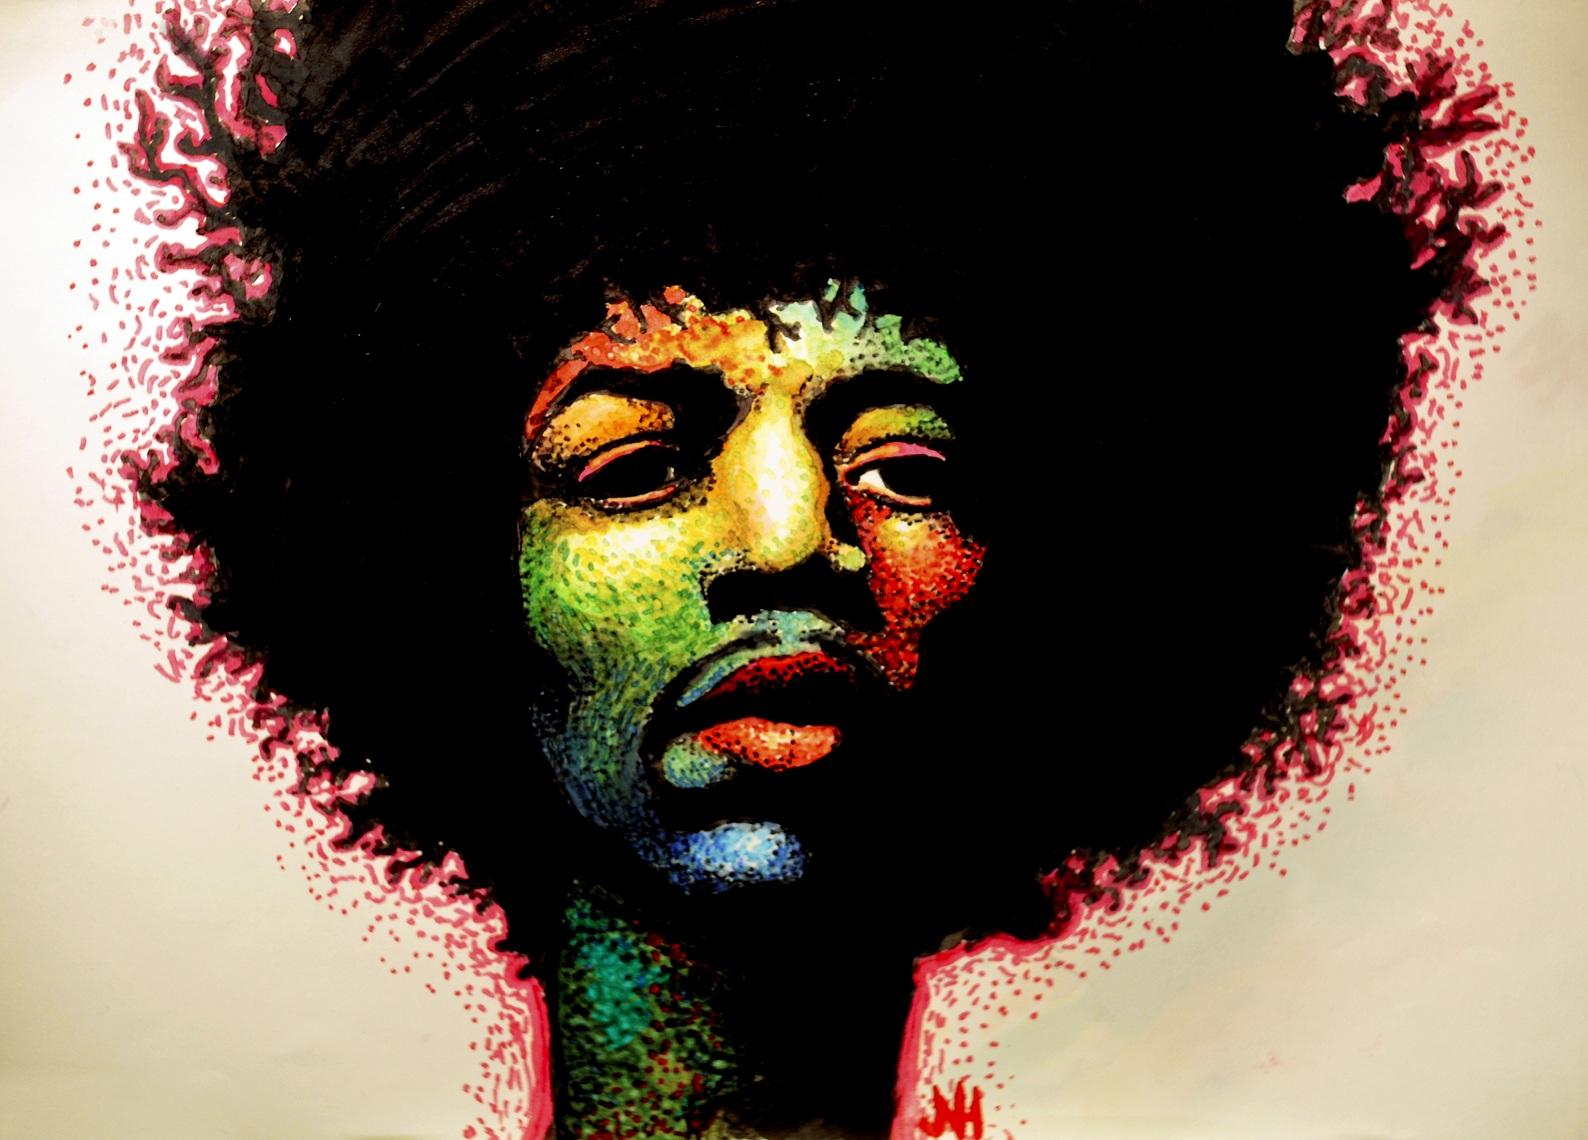 Happy birthday, Jimi Hendrix